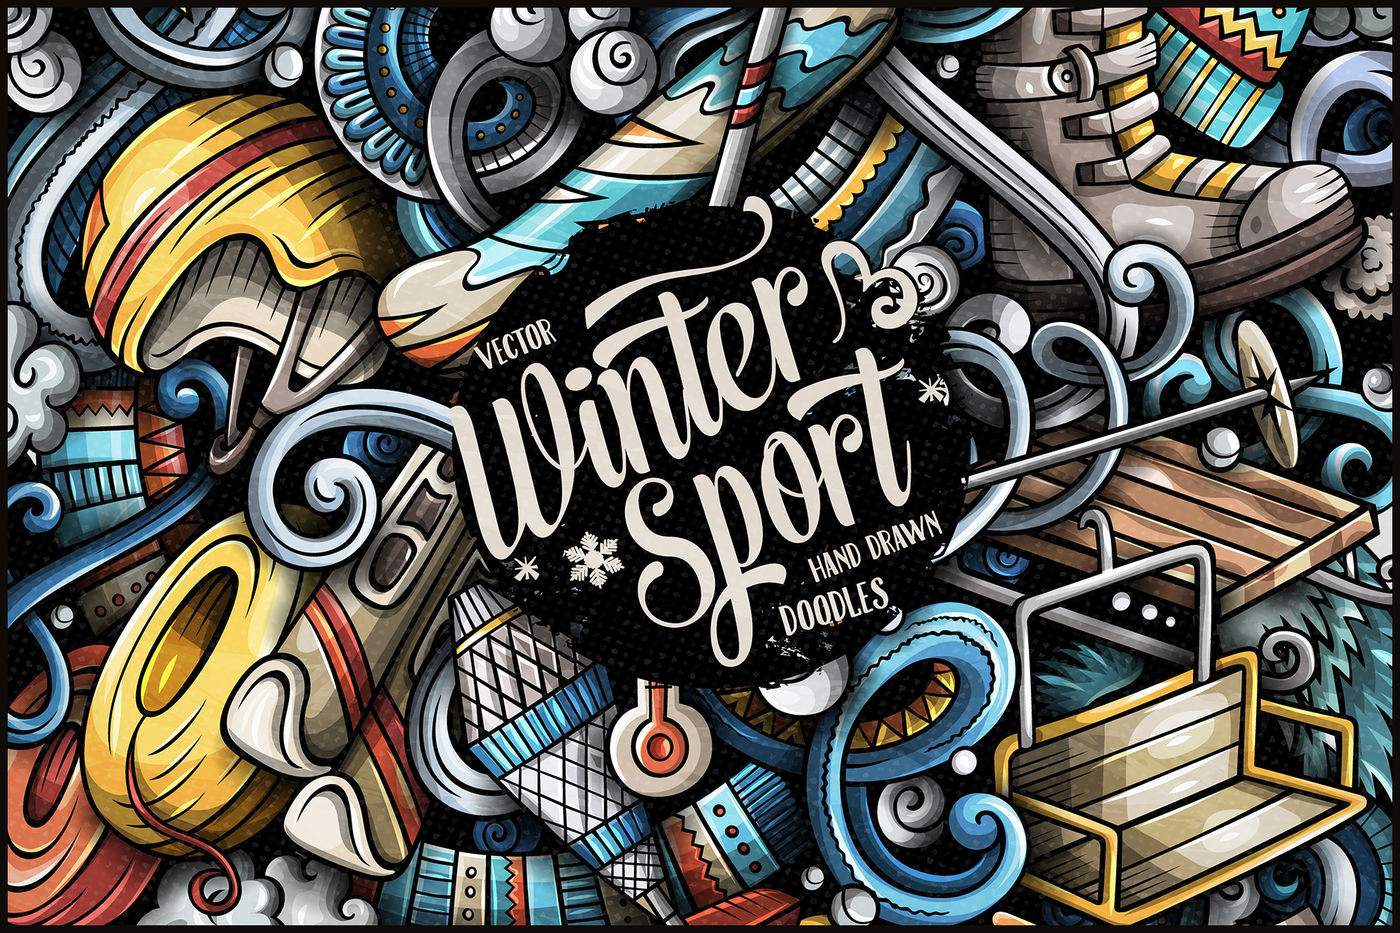 Sport Wallpaper Doodle: Winter Sports Vector Doodle Illustration By Balabolka